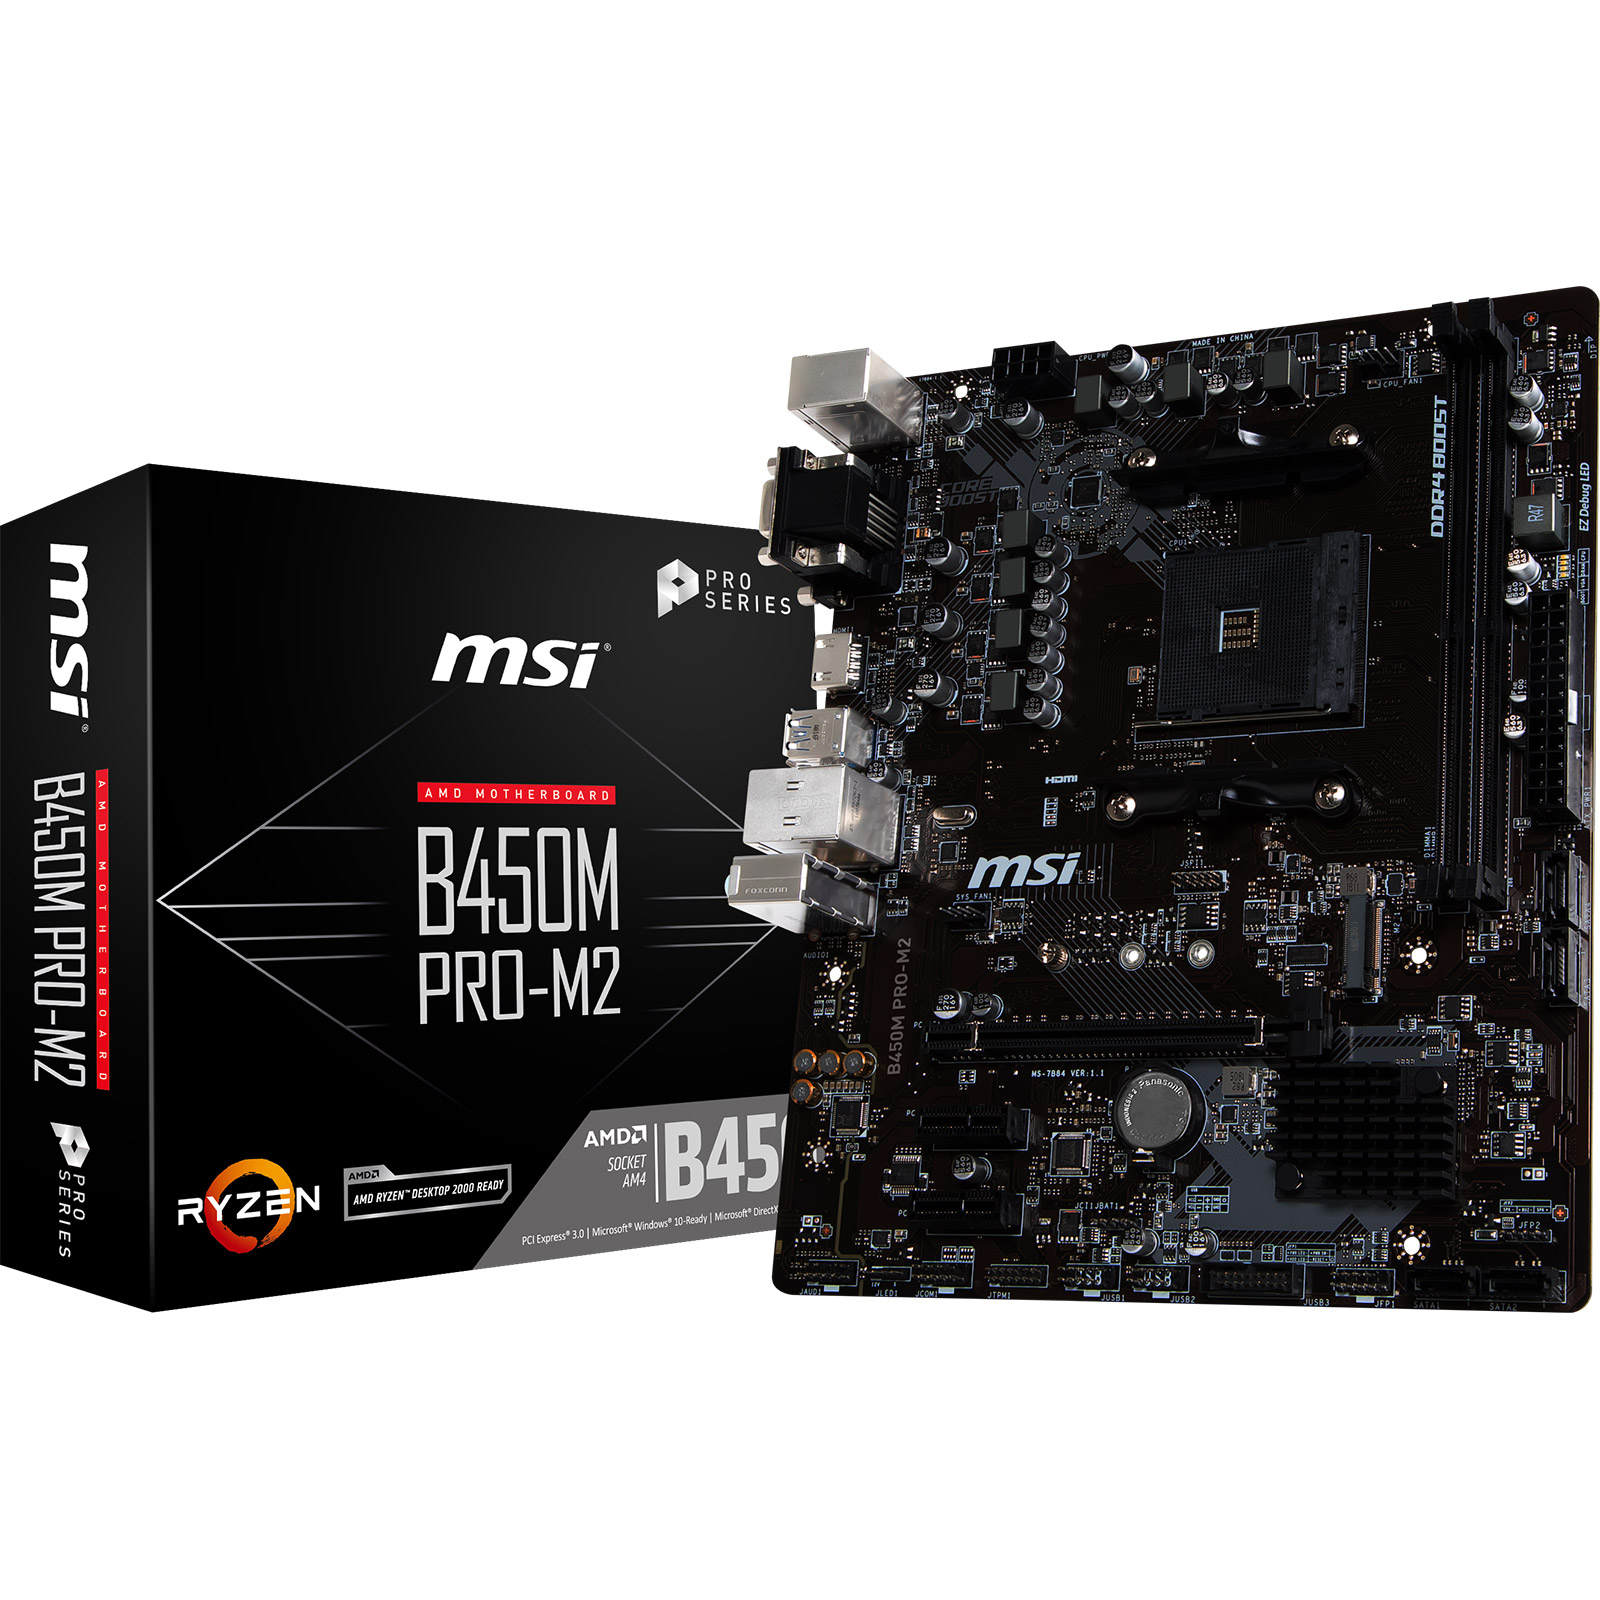 Carte mère MSI B450M PRO-M2 Carte mère Micro ATX Socket AM4 AMD B450 - 2x DDR4 - SATA 6Gb/s + M.2 - USB 3.0 - 1x PCI-Express 3.0 16x